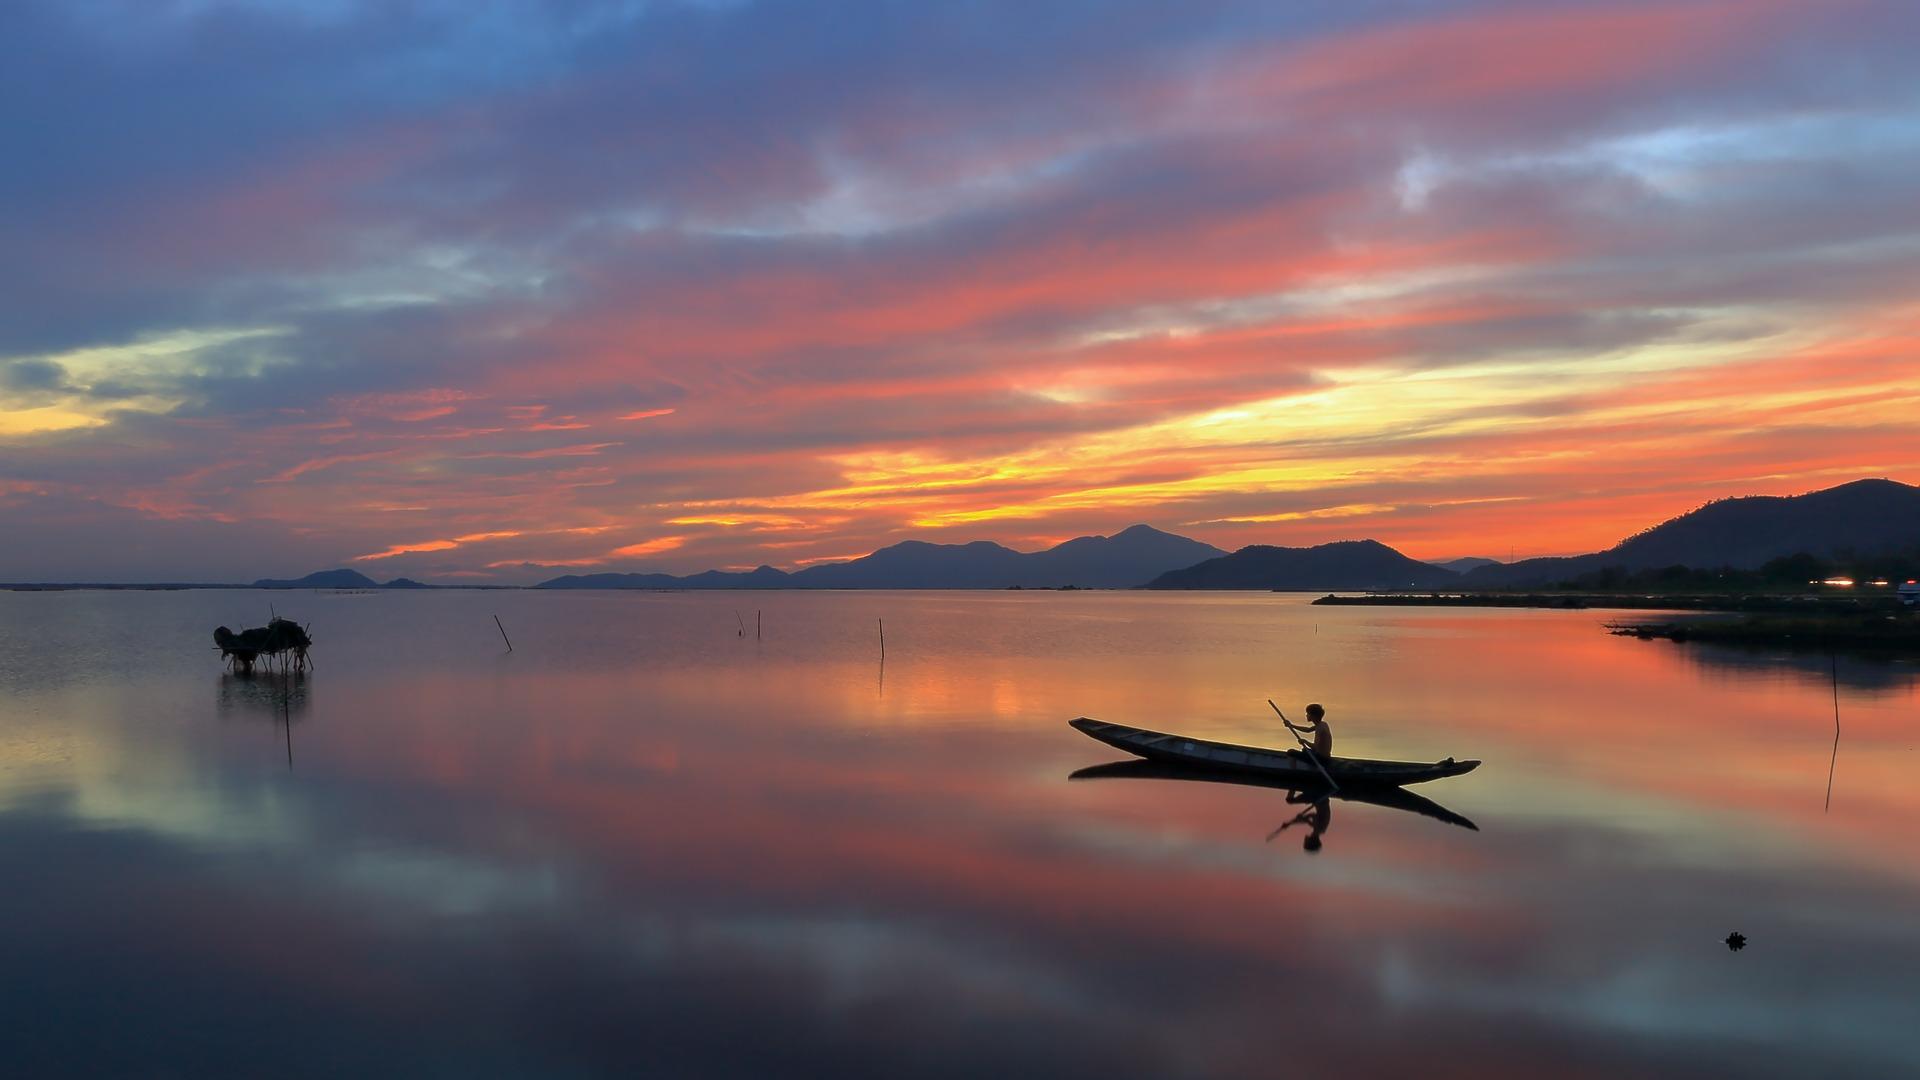 Fishing industry blockchain